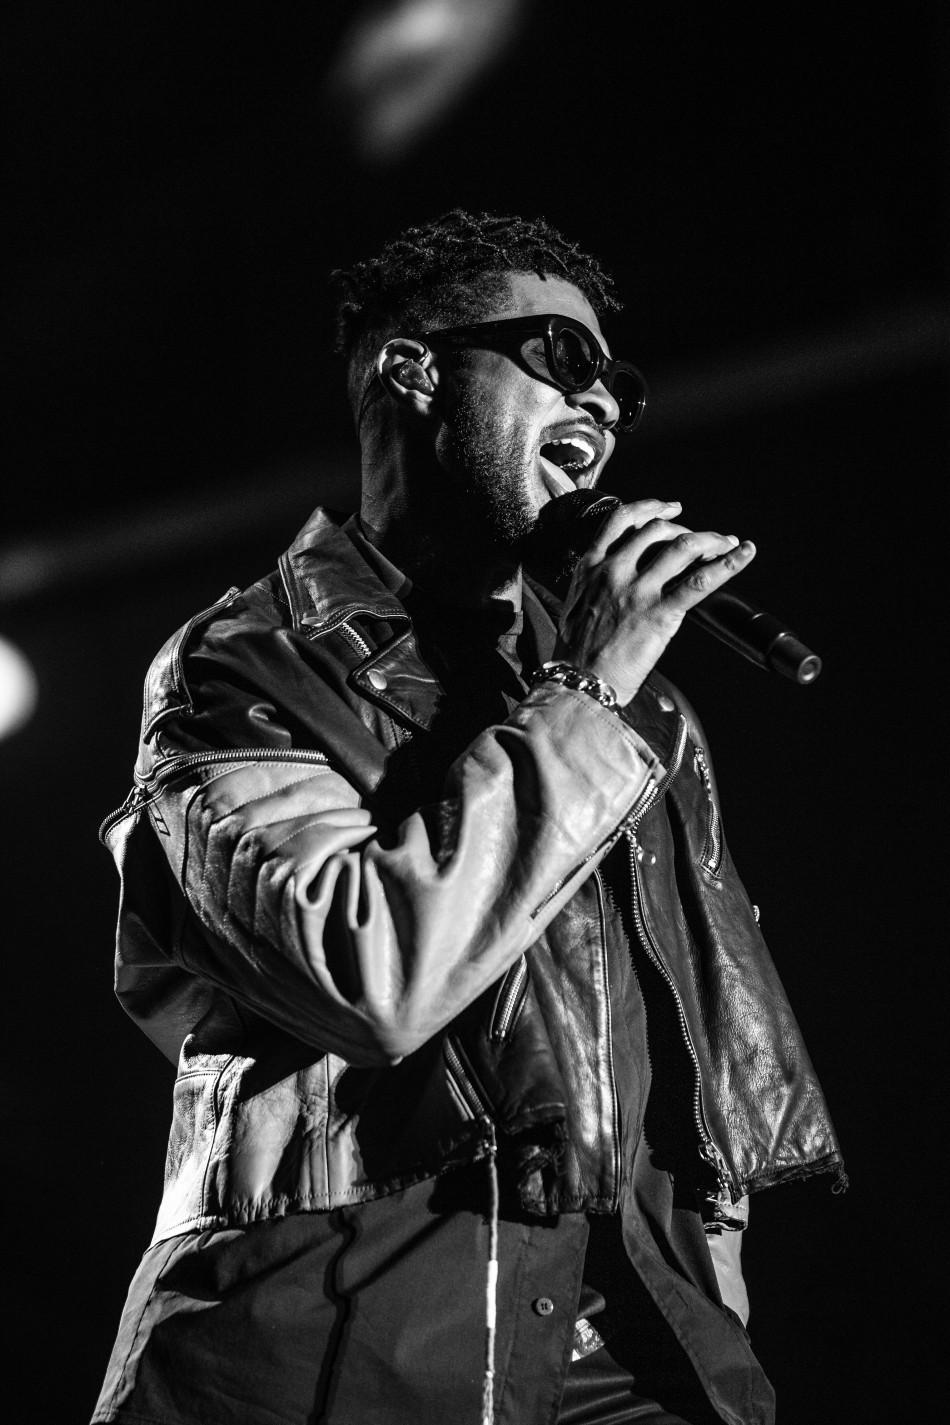 Usher shot by Joseph Baura